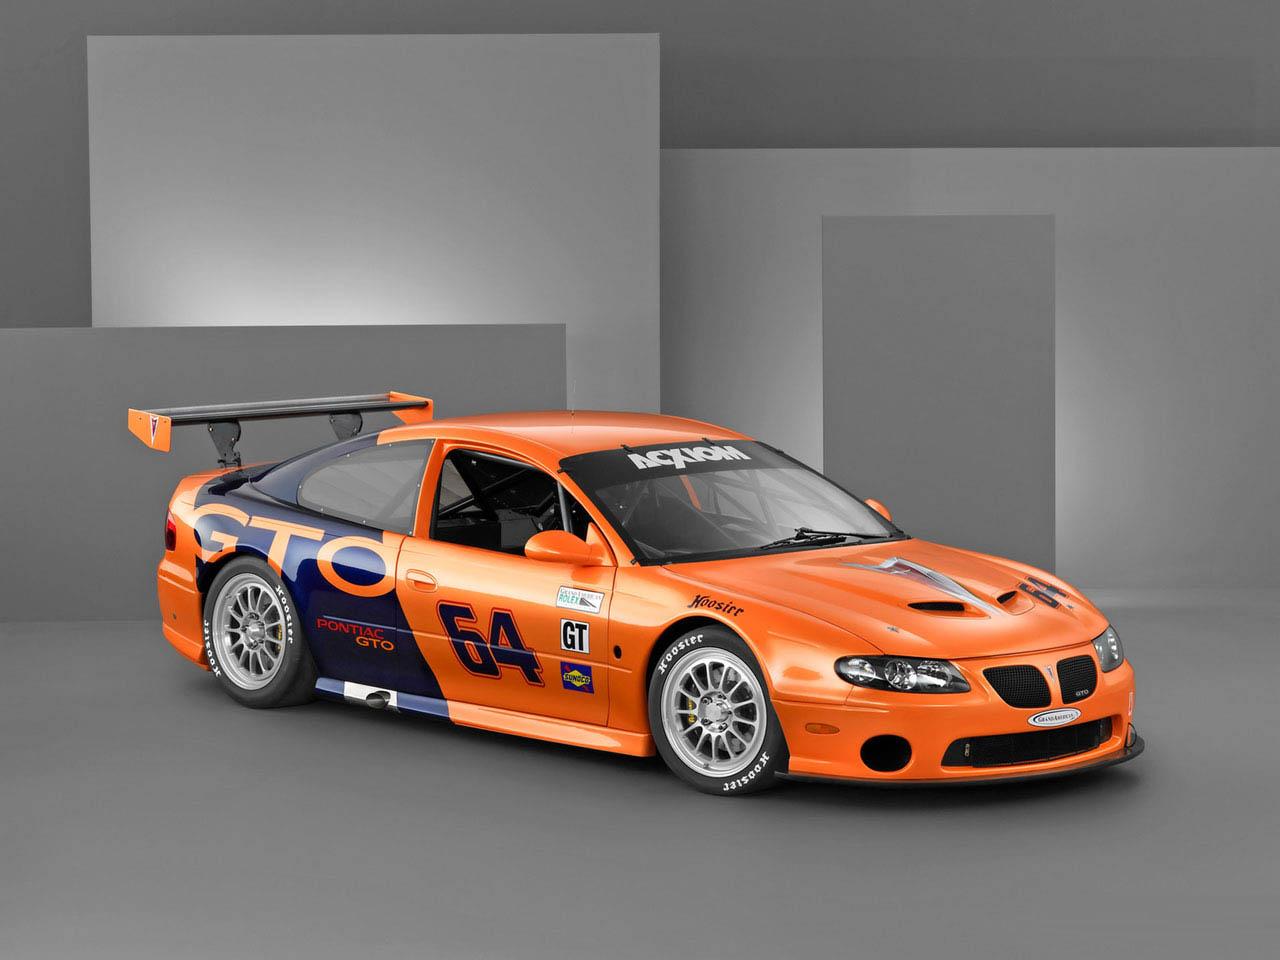 Racing Car Photos Cars Wallpapers And Pictures Car Imagescar Pics